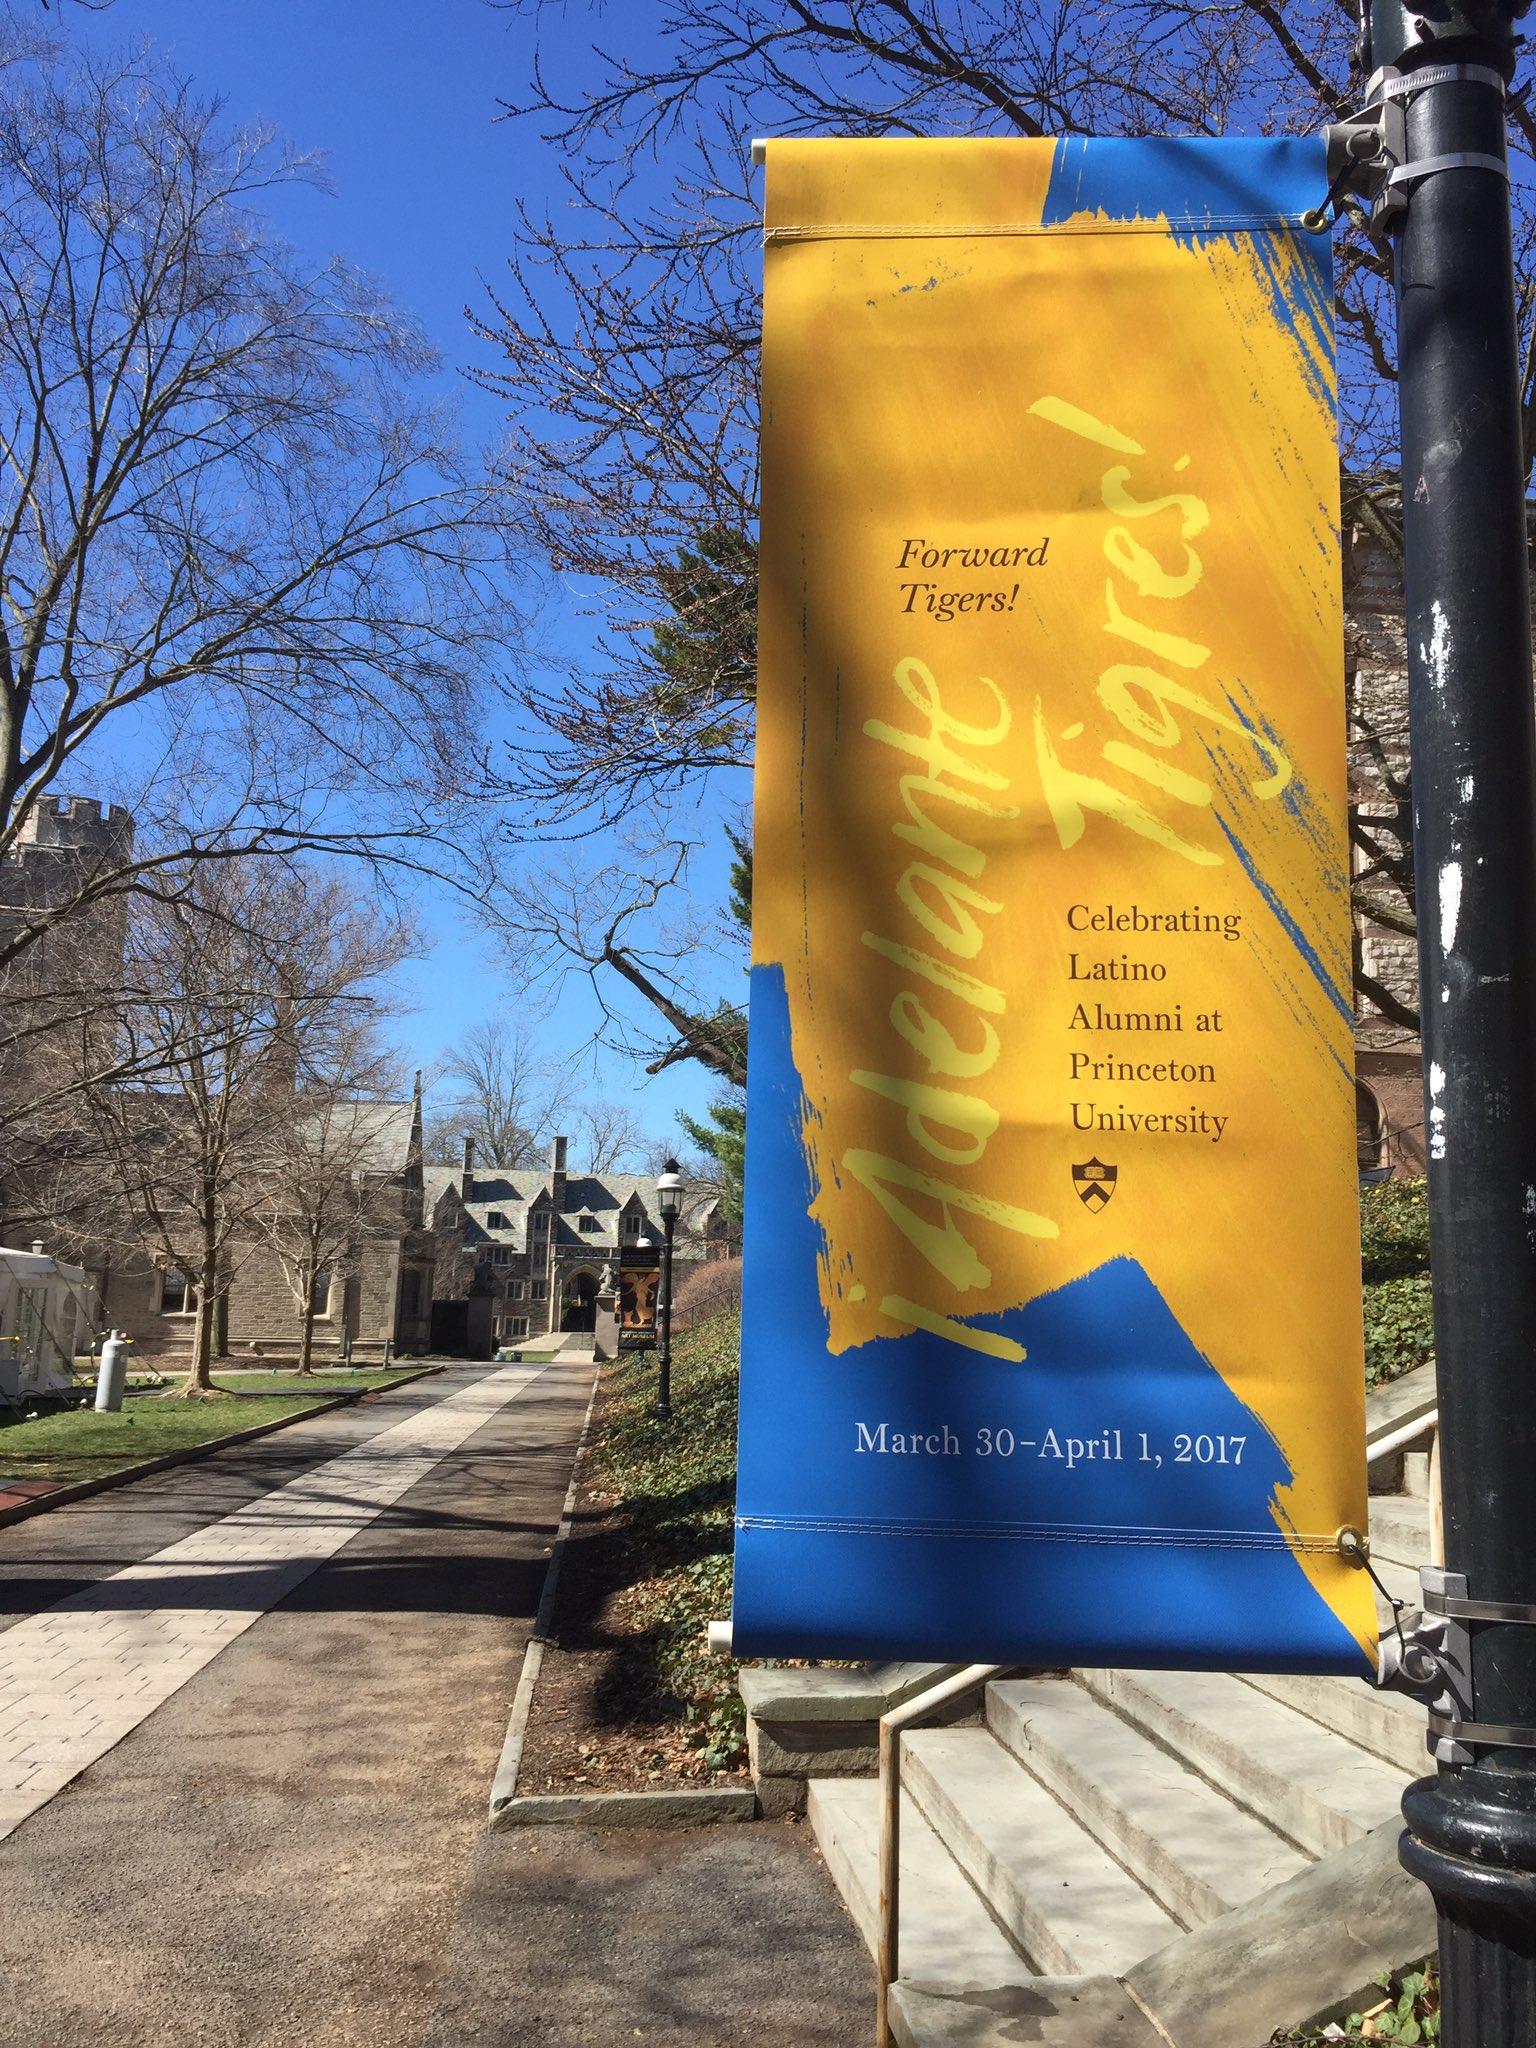 Today begins #Princeton's 1st #Latino/ #Latina/ #Latinx #alumni conference! #AdelantePrinceton @princeton @PrincetonAlumni #PrincetonAlumni https://t.co/1MqCcA2KMi